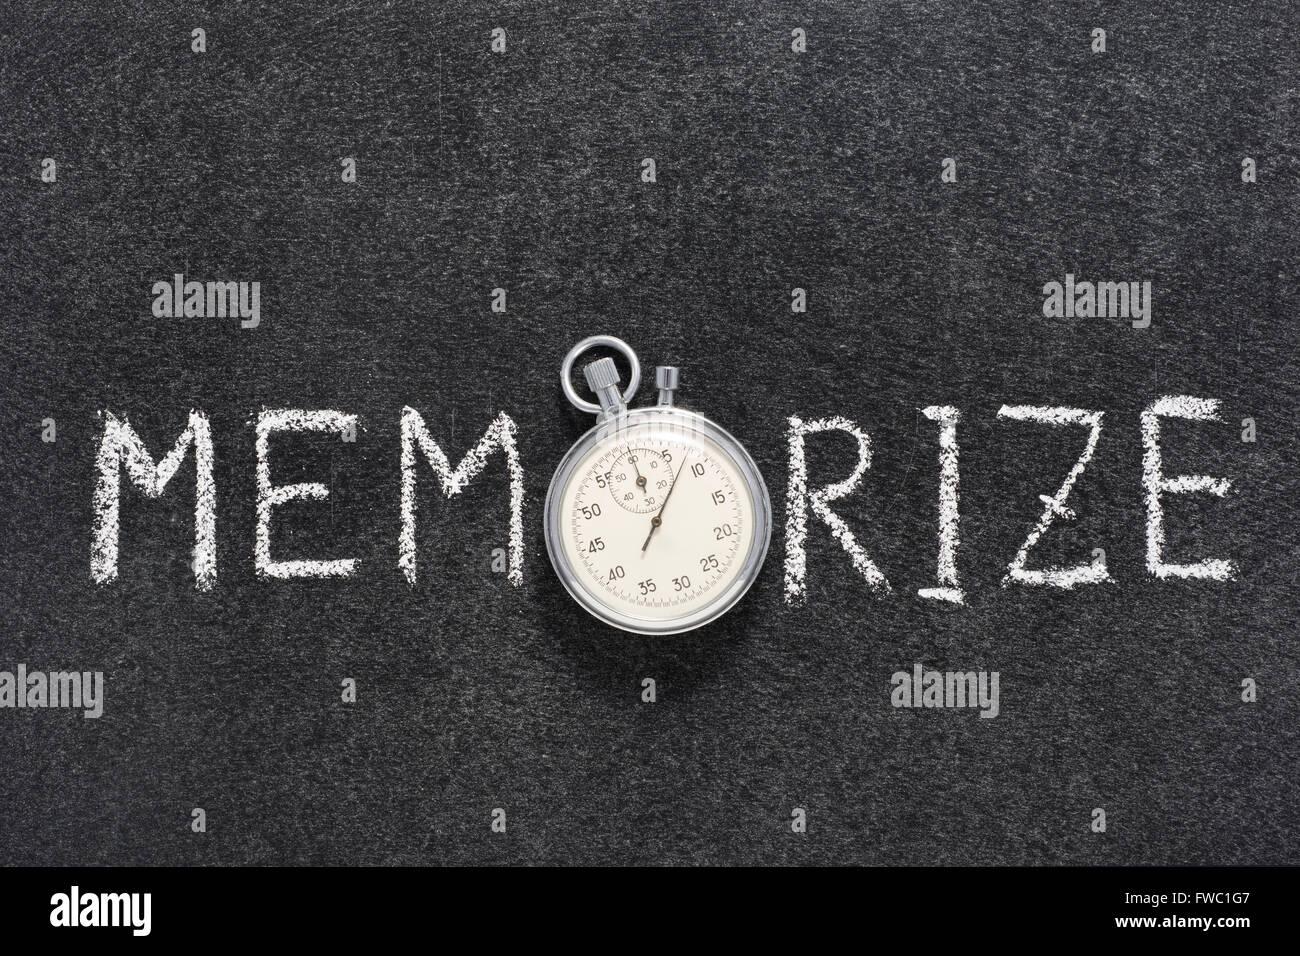 Memorize Word manuscrito en pizarra con vintage cronómetro exacto utilizado en lugar de O Imagen De Stock